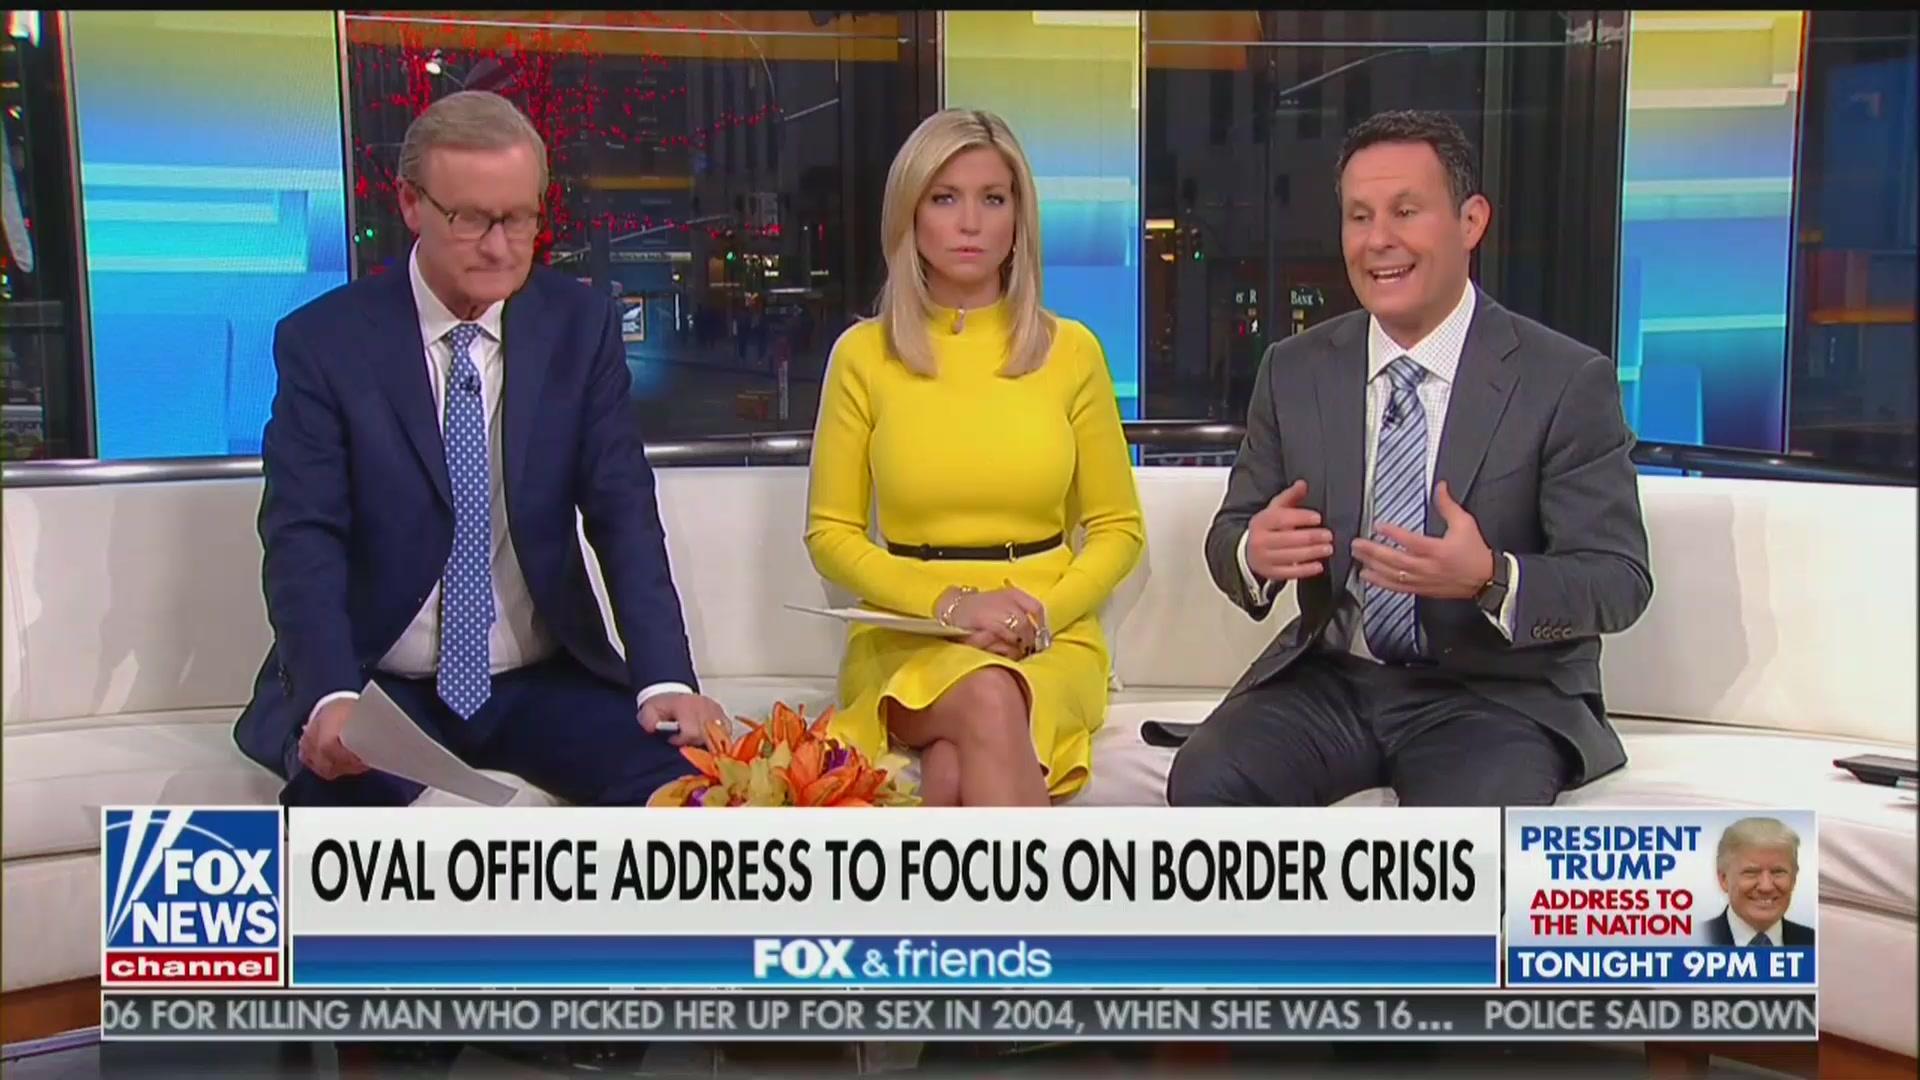 Fox's Brian Kilmeade Warns About Migrant Kids Who 'Don't Speak English' Flooding US Schools